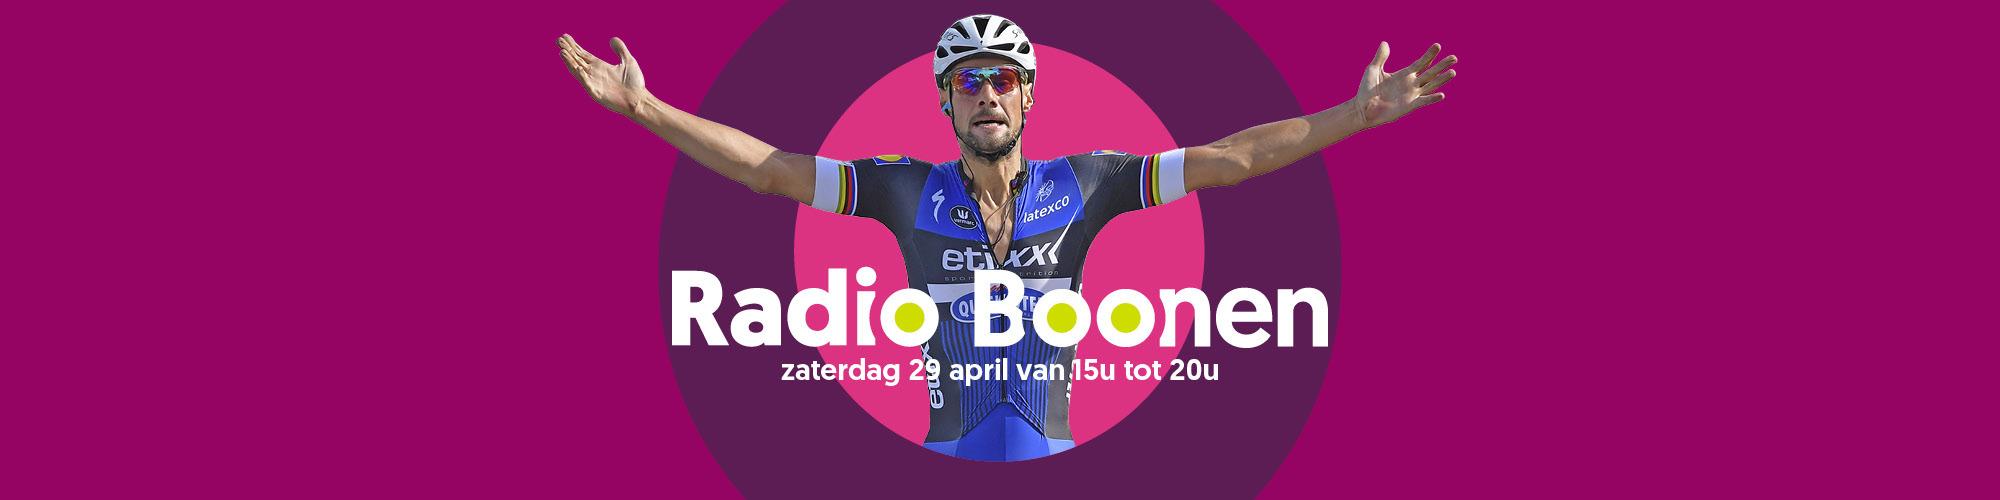 Radio boonen 2000x500 def